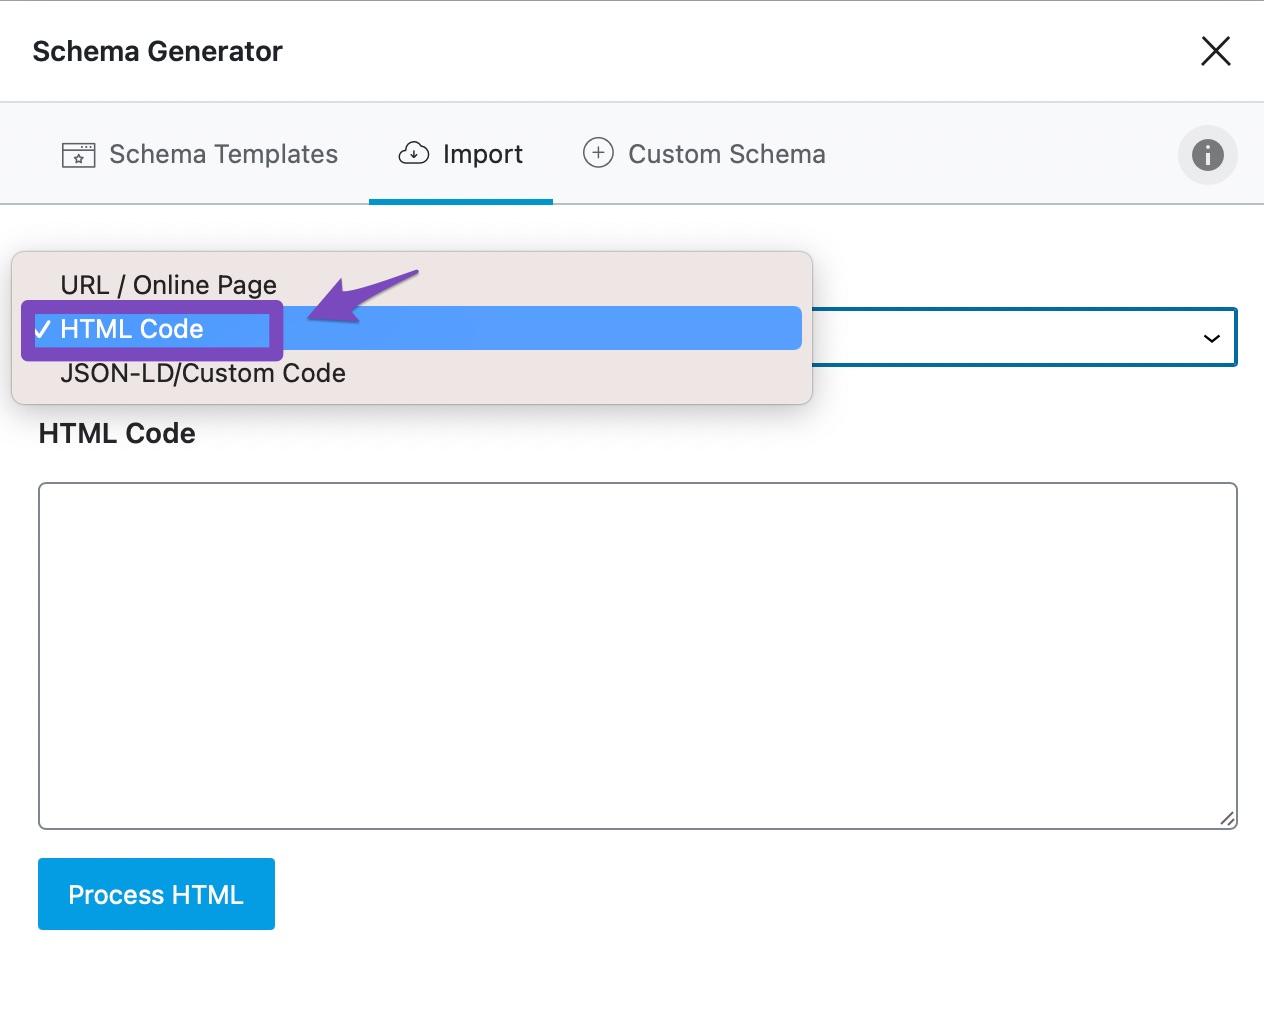 select HTML Code option